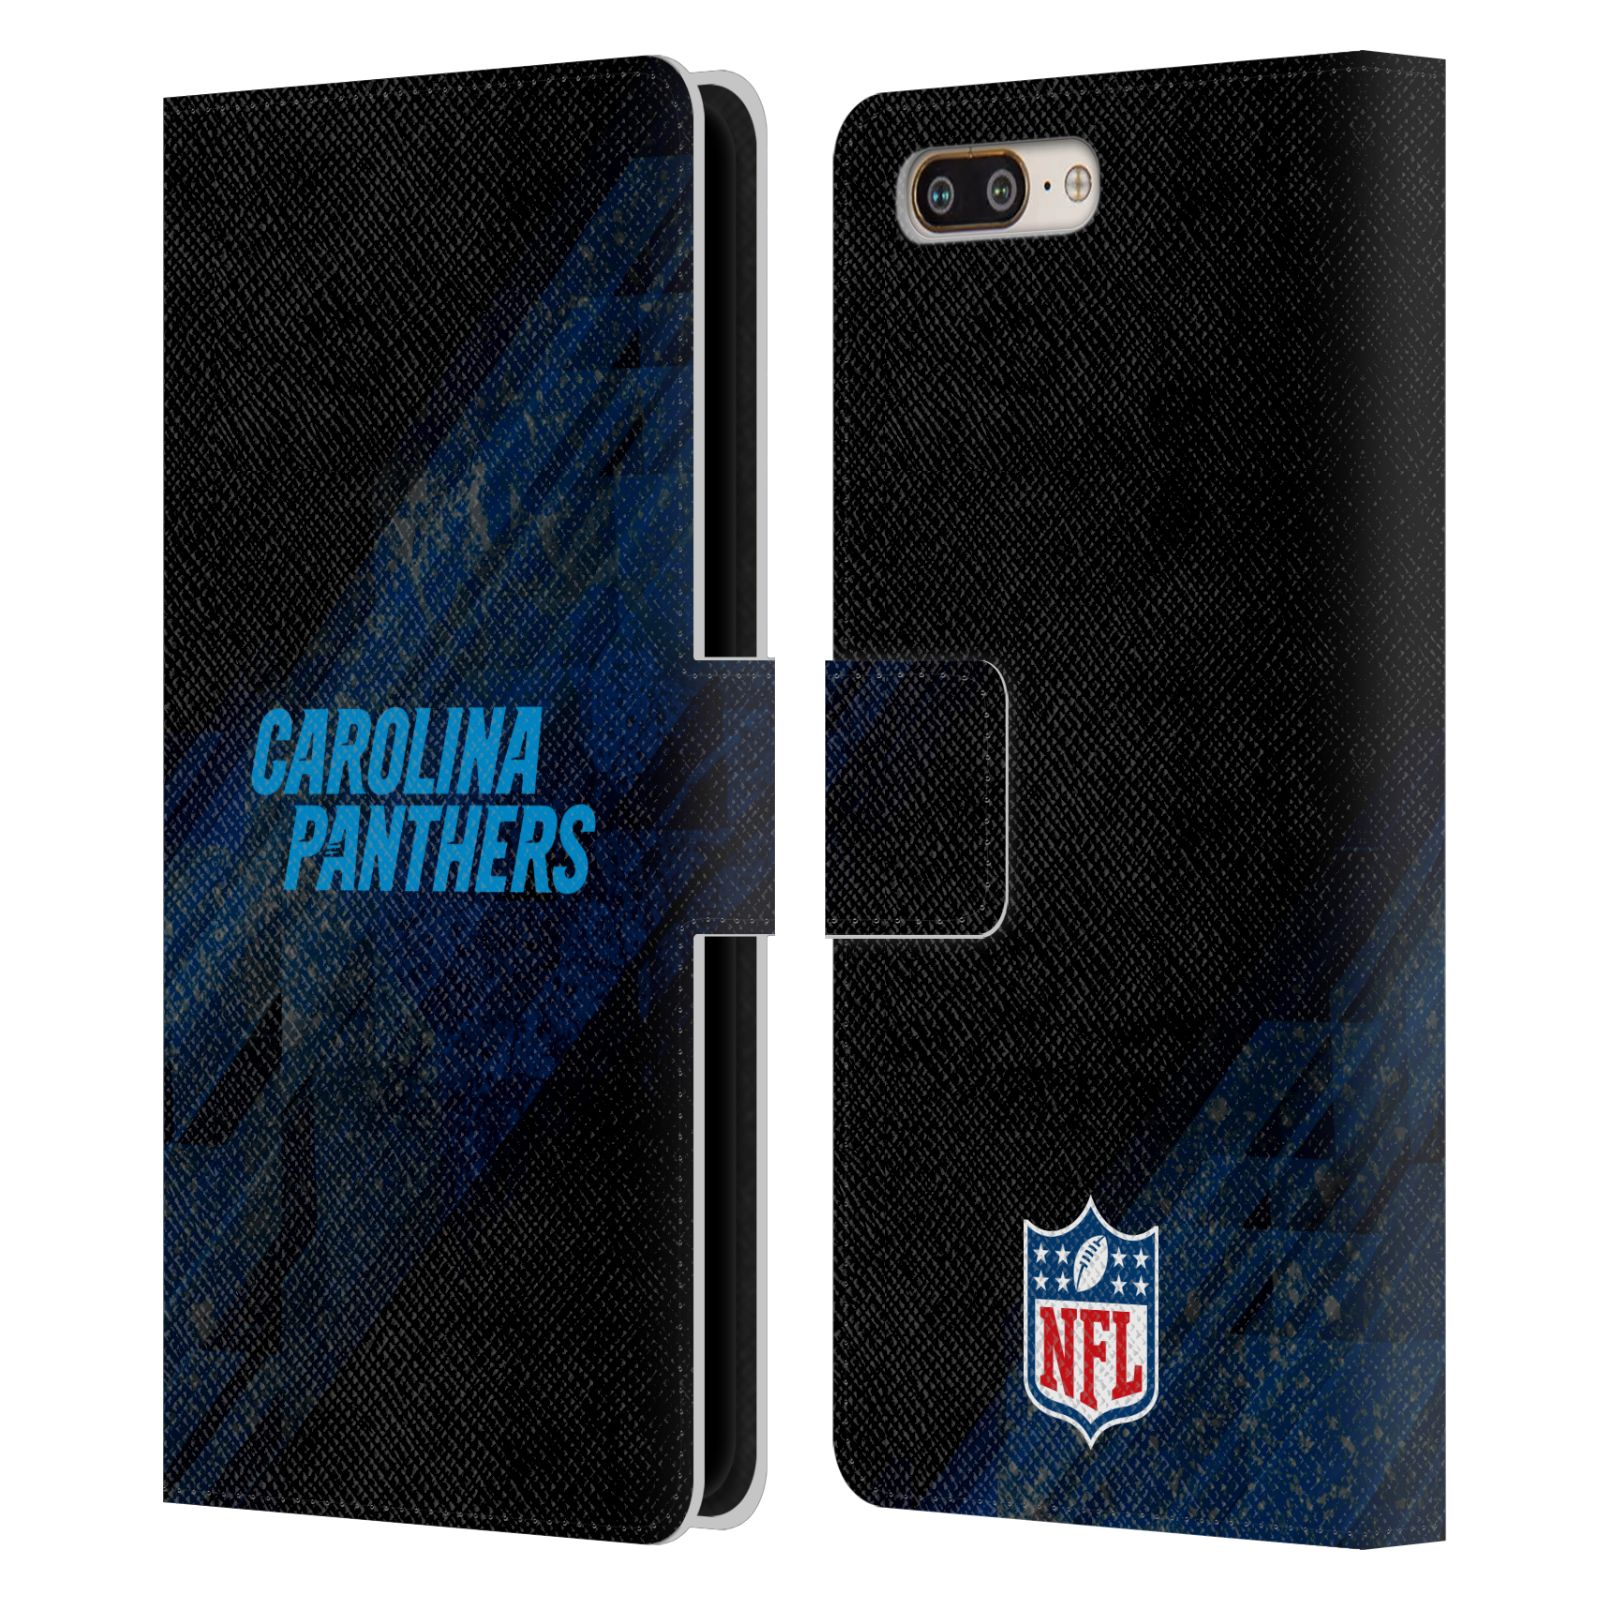 UFFICIALE-NFL-CAROLINA-PANTHERS-LOGO-COVER-A-PORTAFOGLIO-PER-BLACKBERRY-ONEPLUS